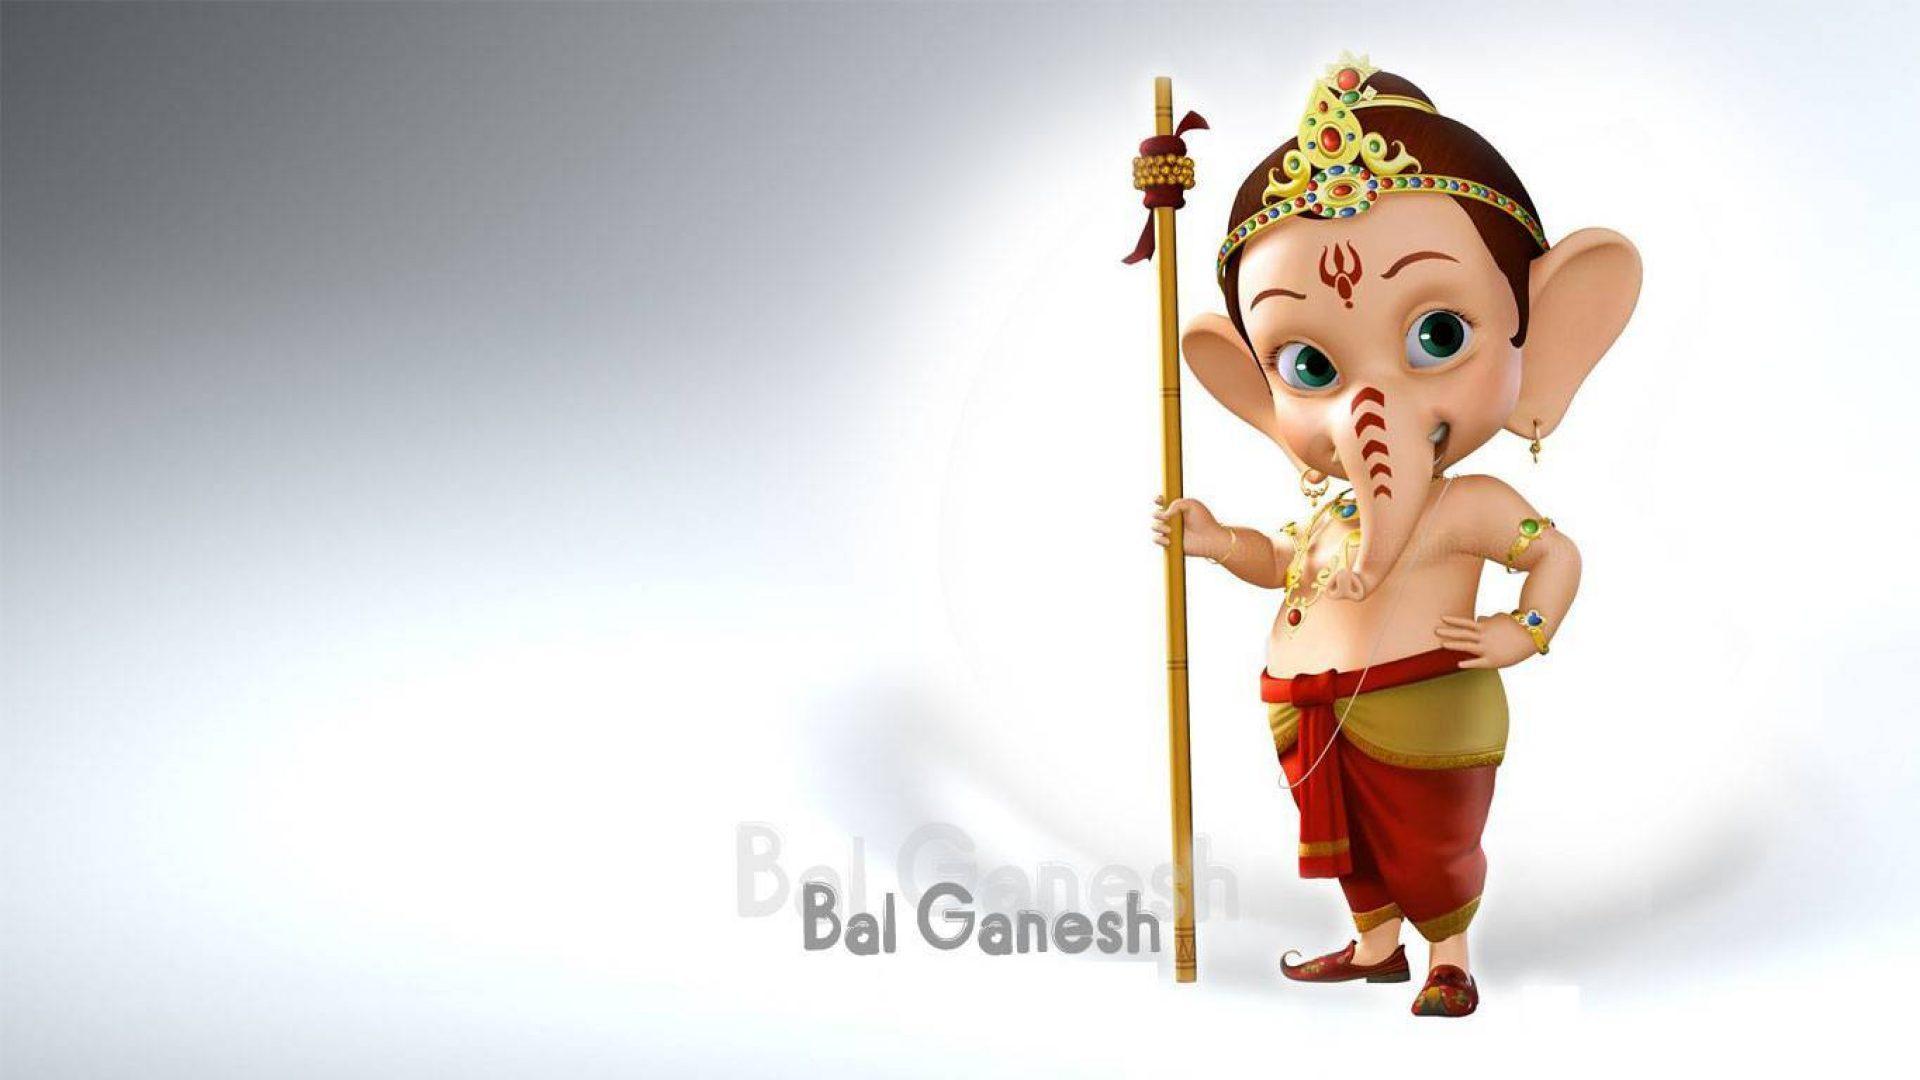 Ganpati Hd Wallpapers 1920x1080: Little Bal Ganesh 3D HD Wallpaper 1366×768